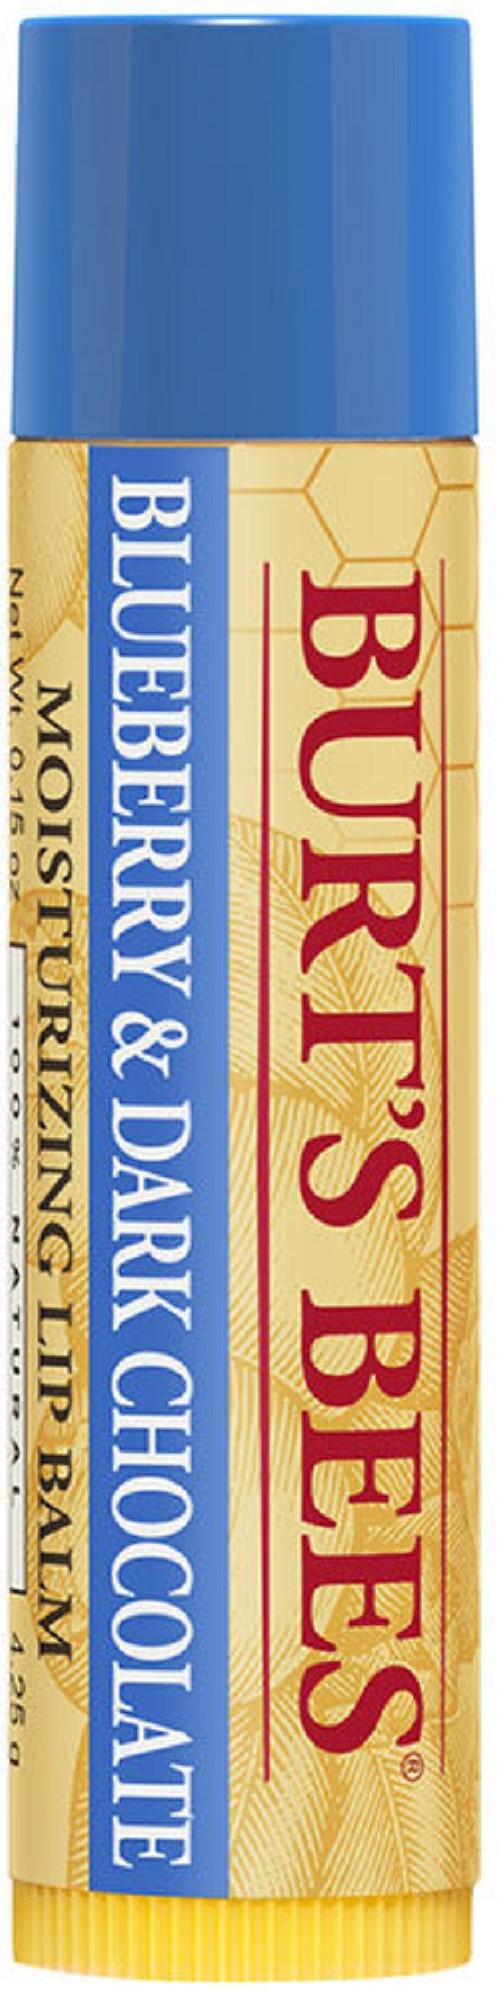 Burts Bees Revitalizing Lip Balm with Blueberry & Dark Chocolate, 0.15 oz (Pack of 4) (6 Pack) mehron E.Y.E Cream - Deep Blue